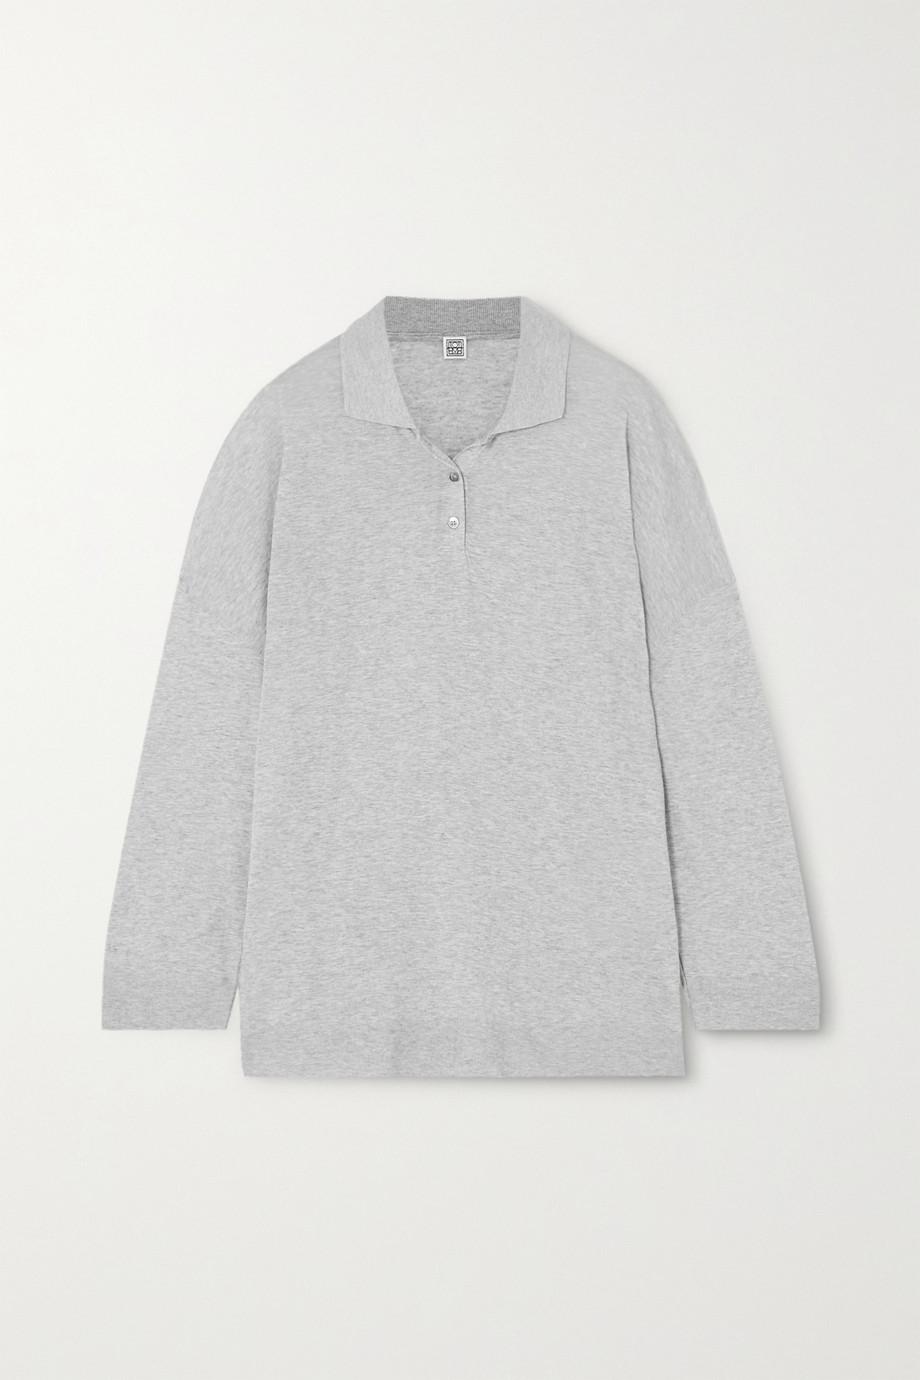 Totême Barzio 混色赛尔纤维棉质混纺毛衣